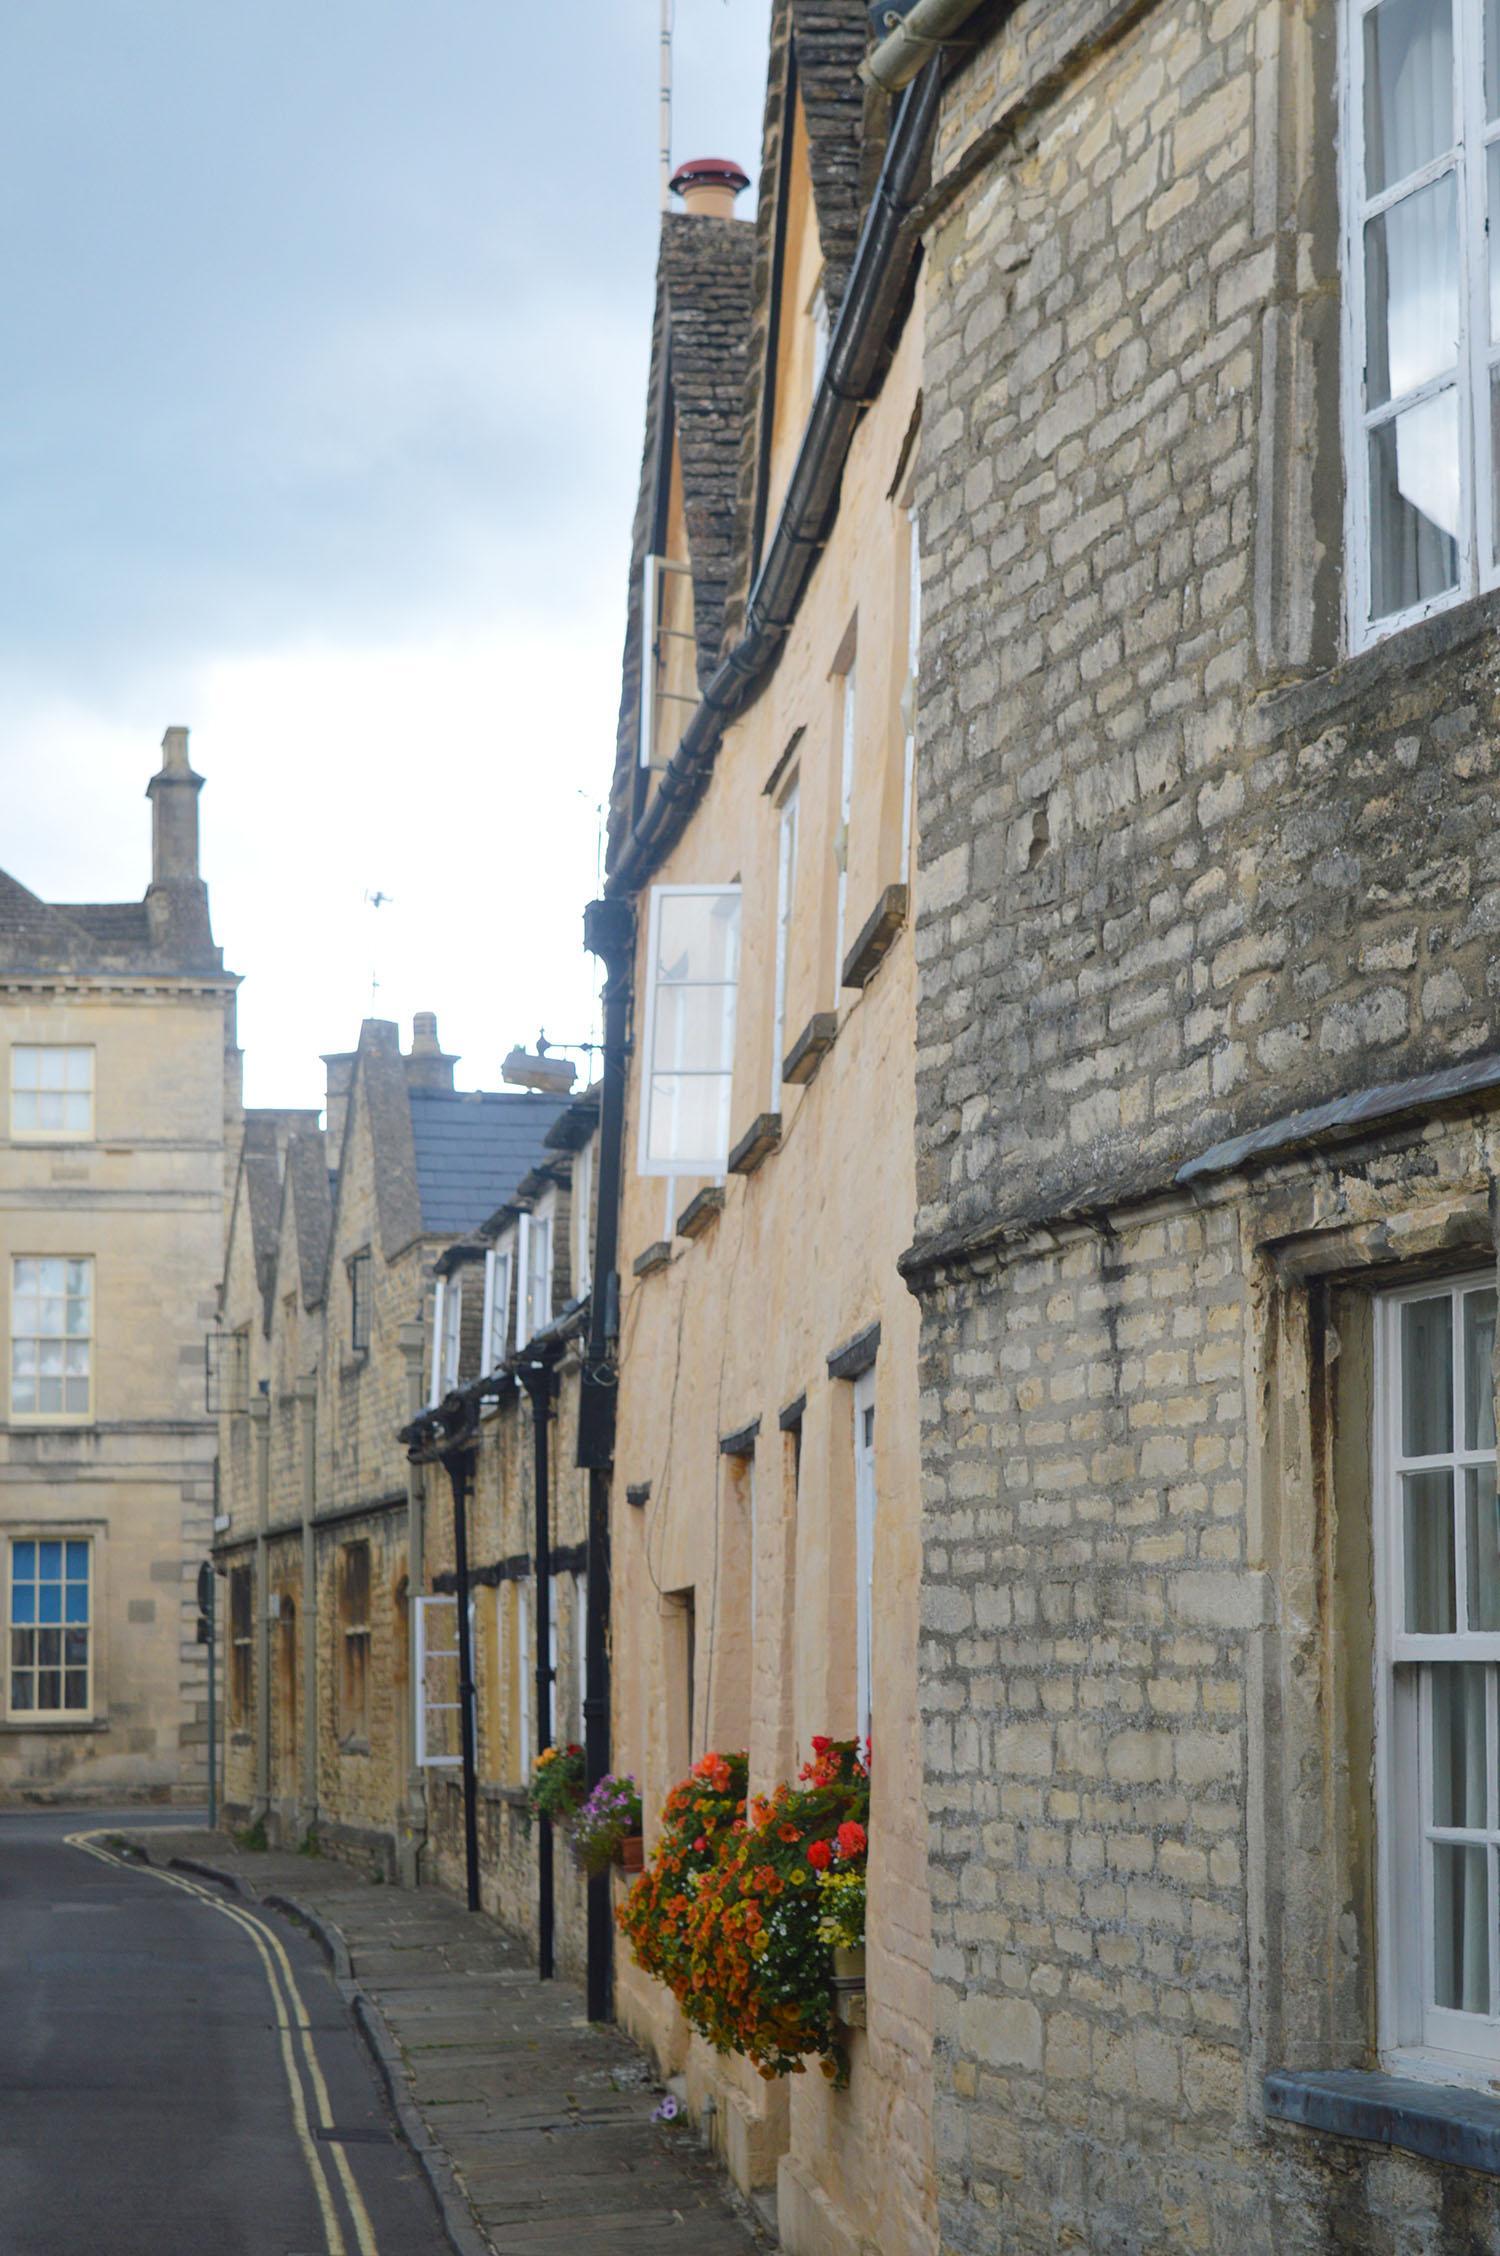 Exploring Cirencester